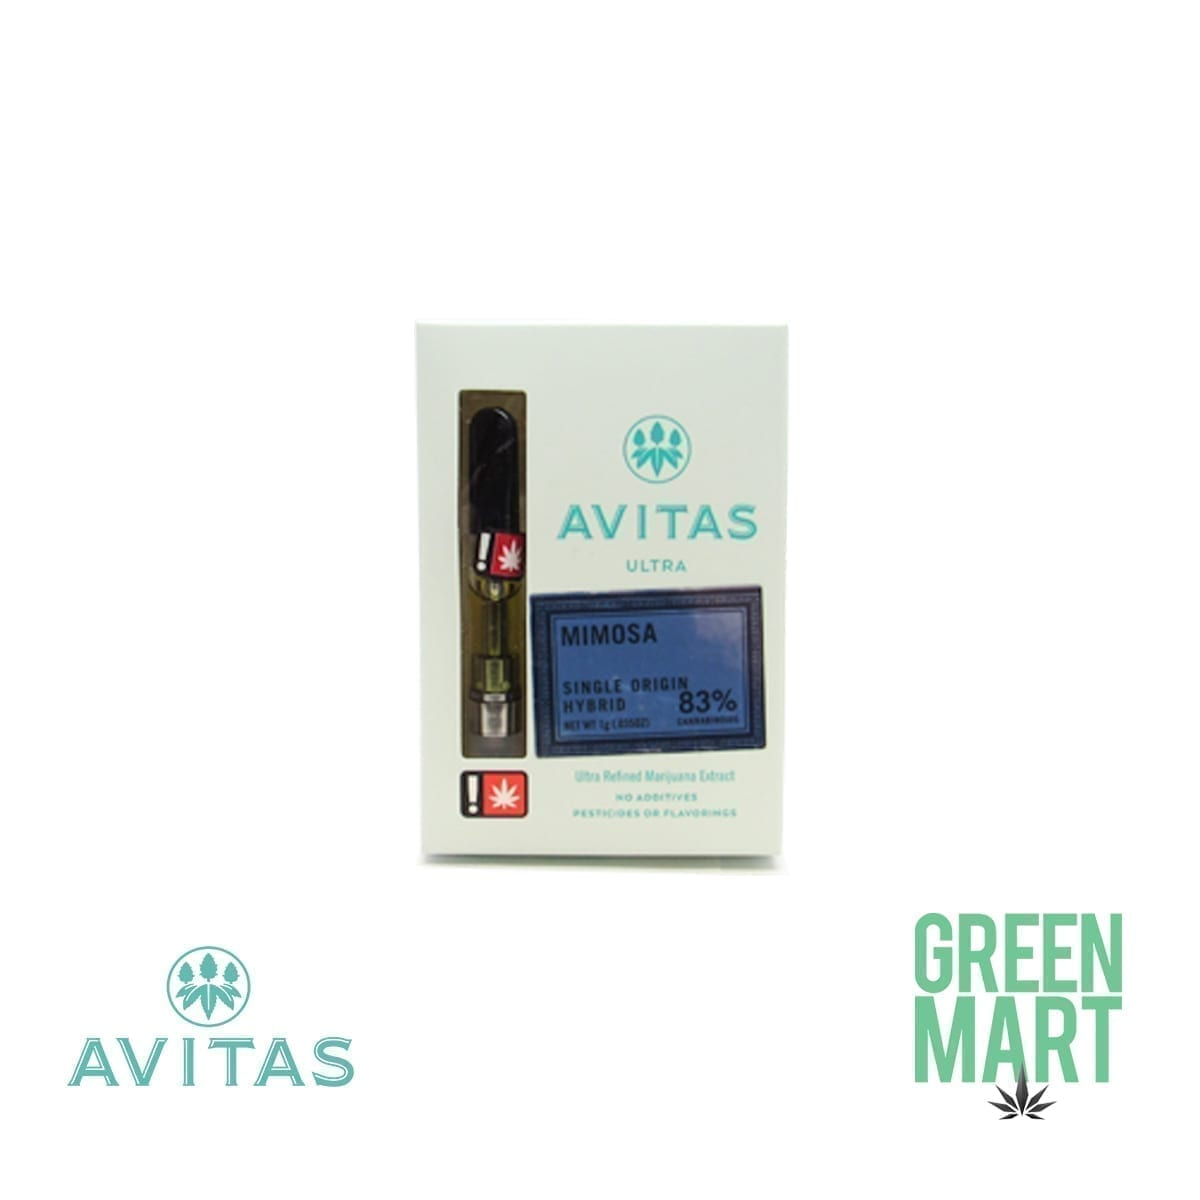 Avitas Ultra Distillate Cartridge - Mimosa